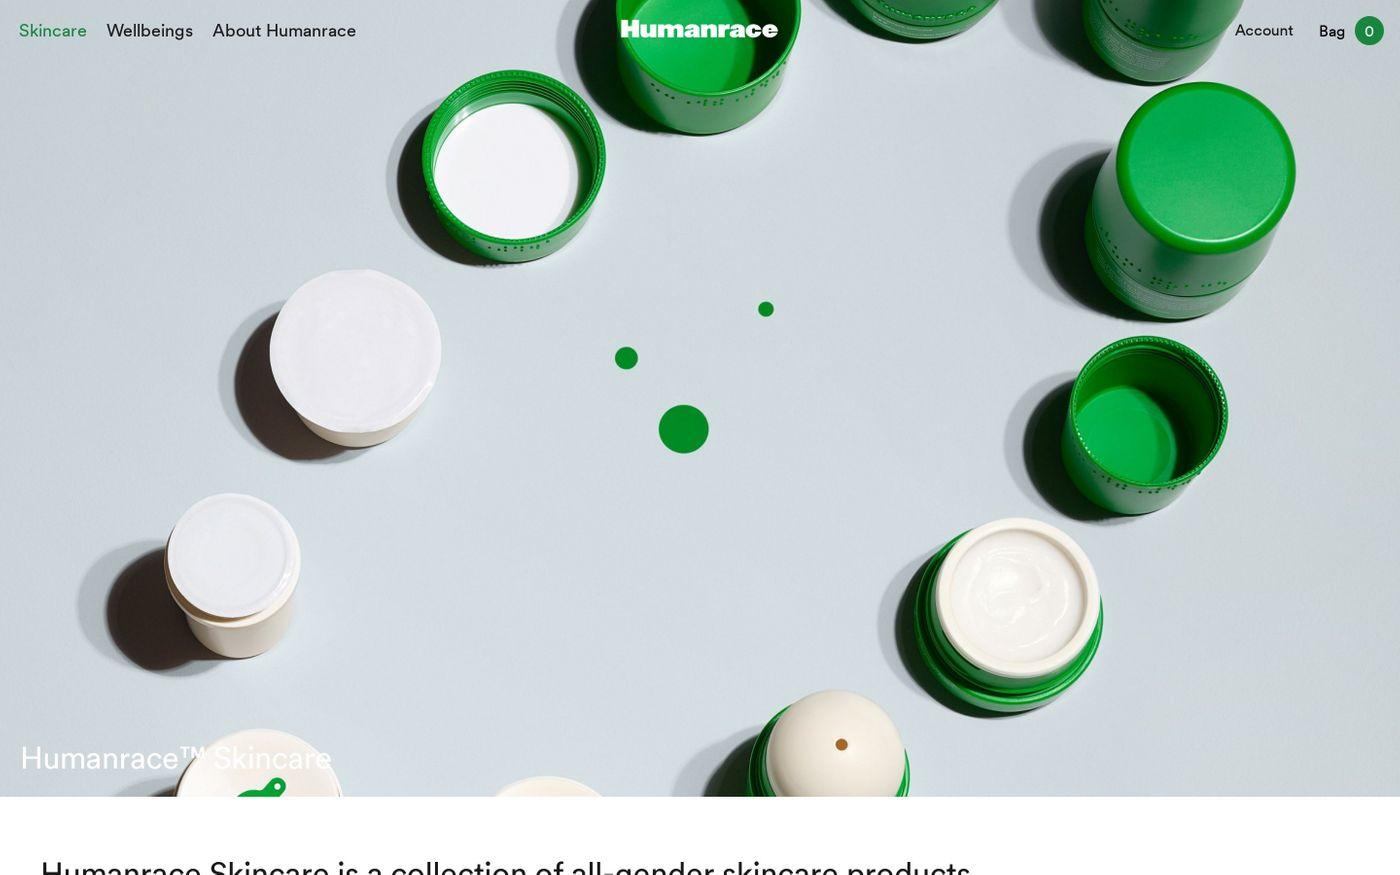 Screenshot of Humanrace website